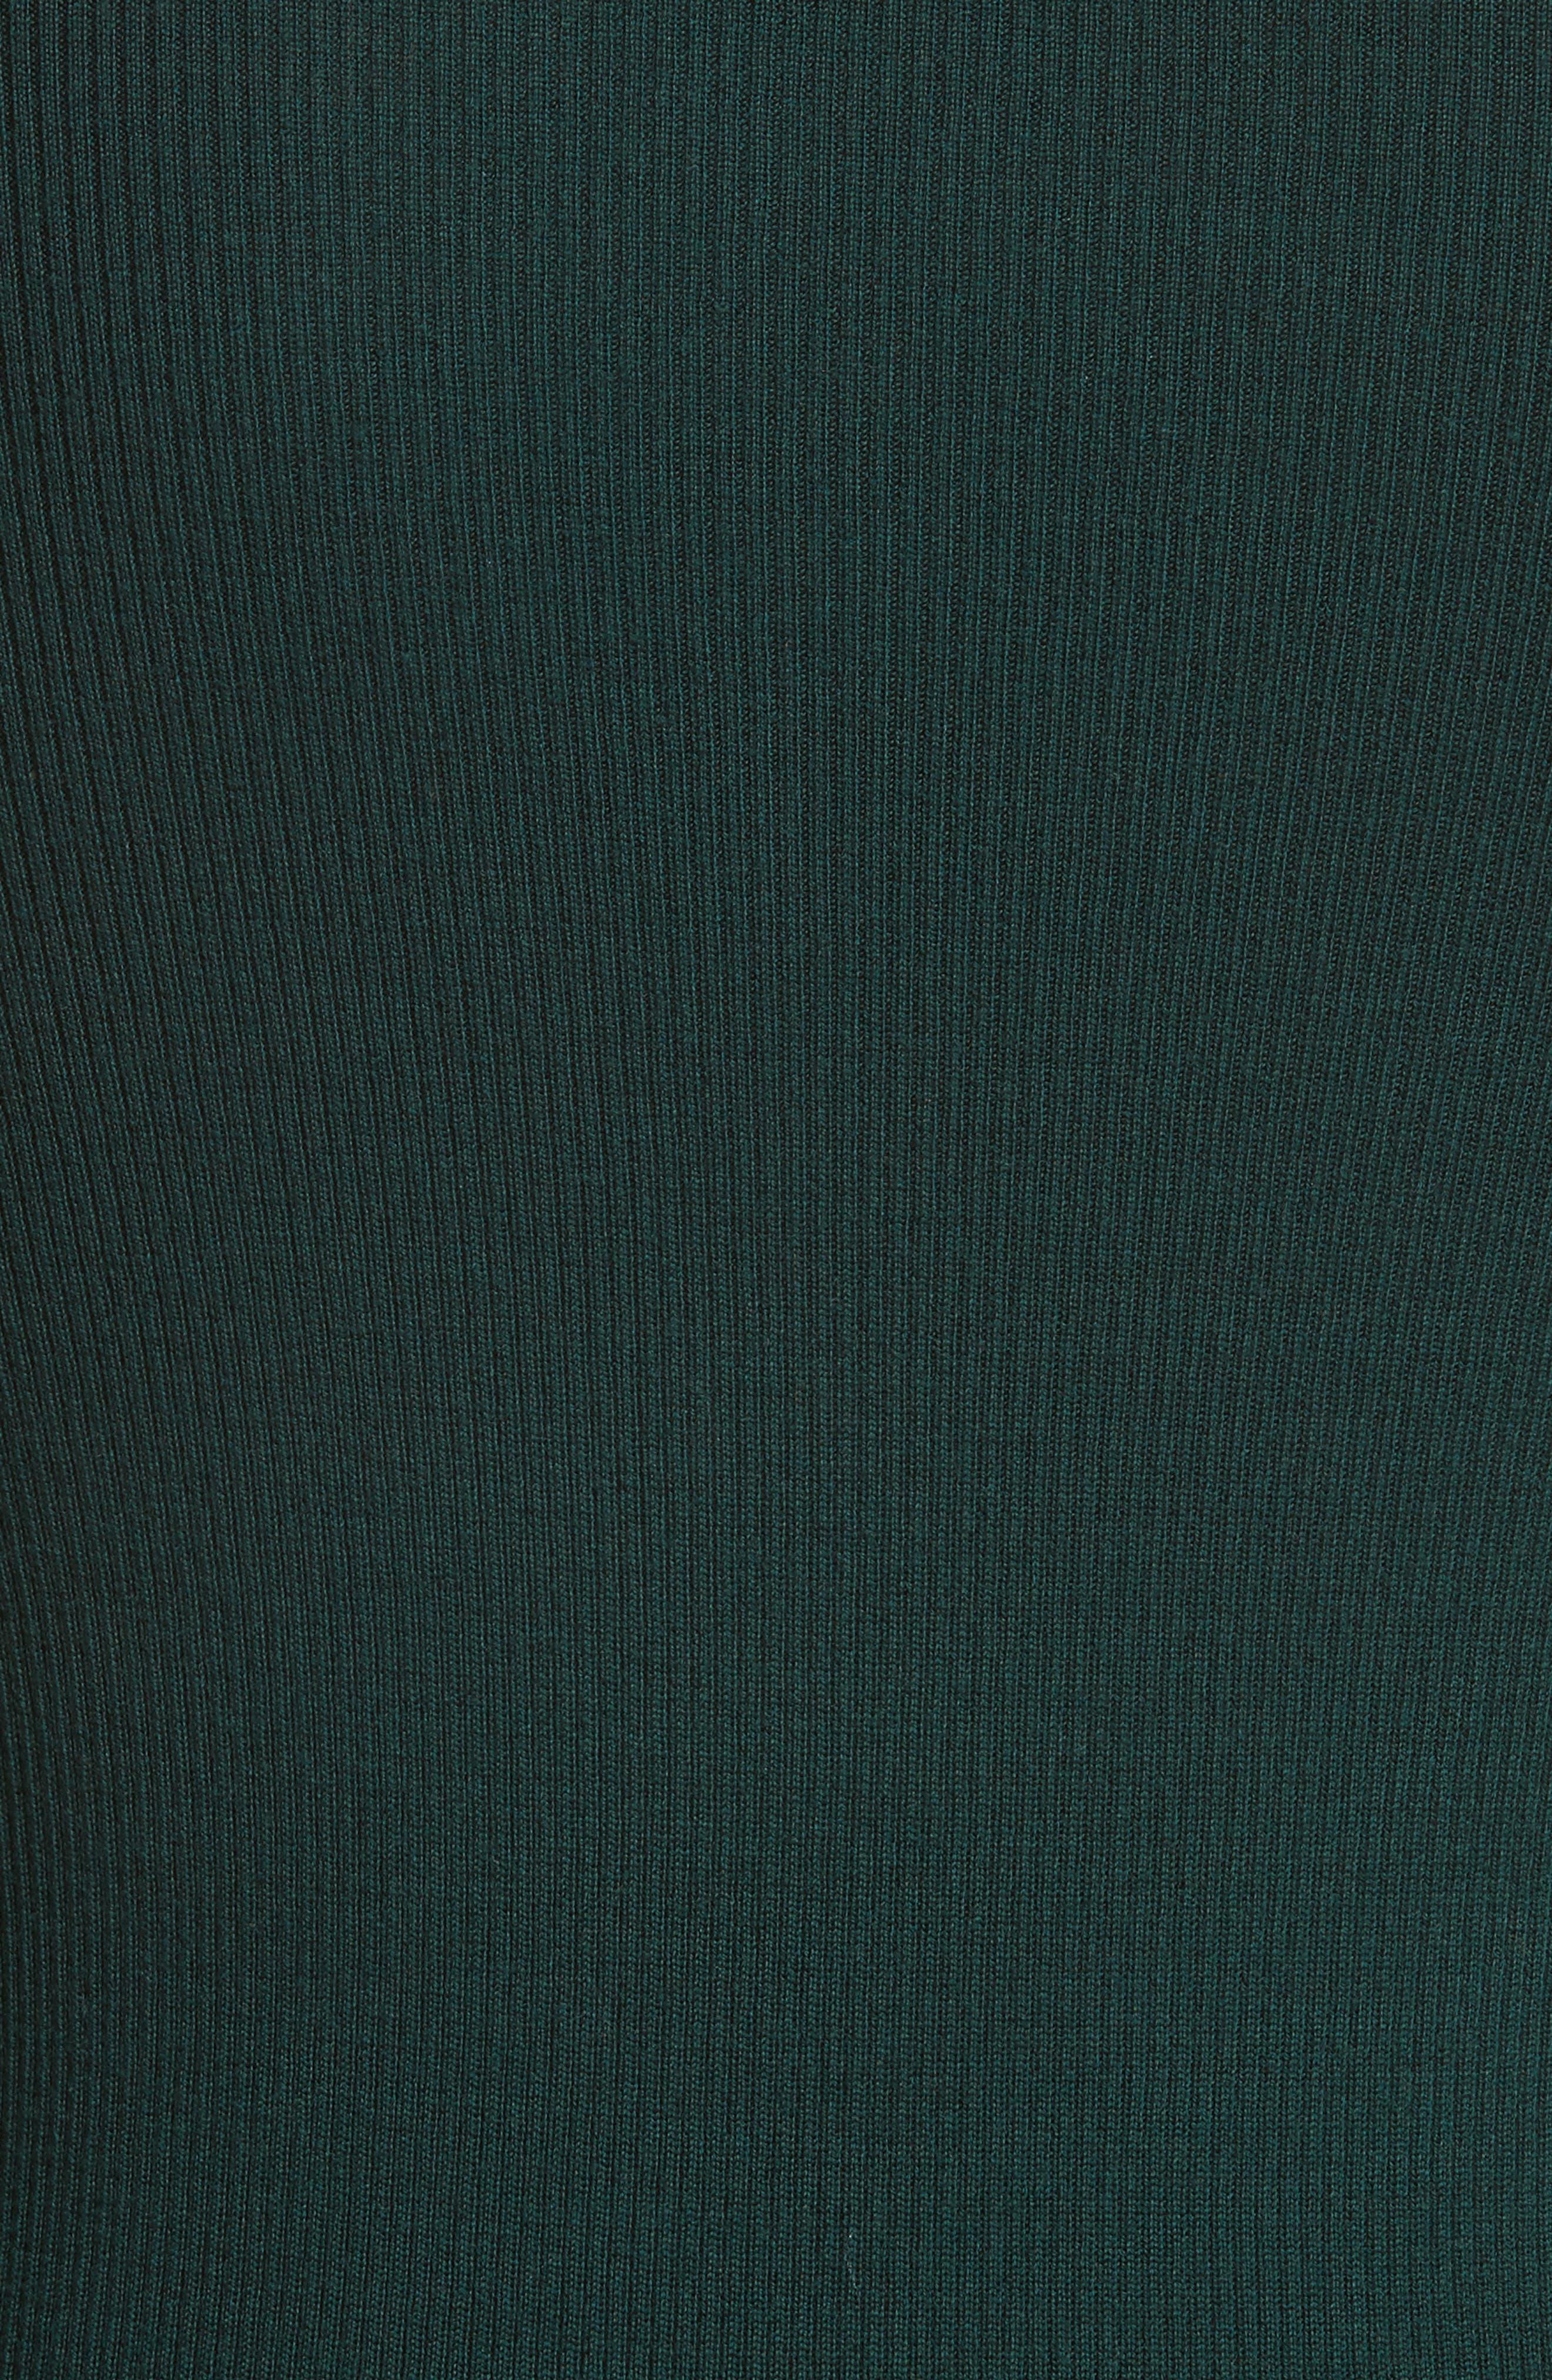 Mirzi Ribbed Sweater,                             Alternate thumbnail 5, color,                             308